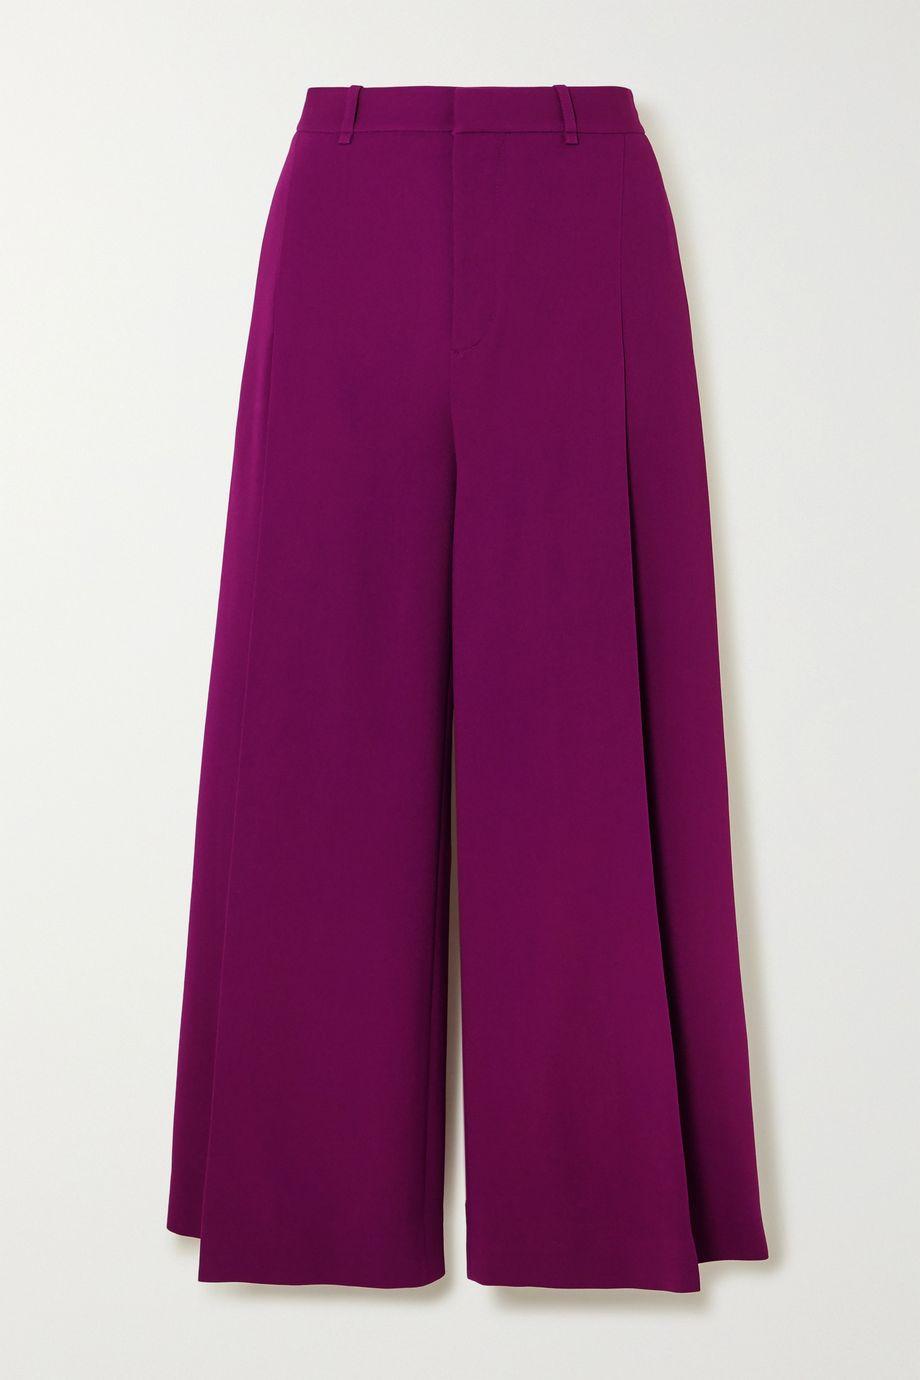 Roland Mouret Liberty stretch-crepe wide-leg pants